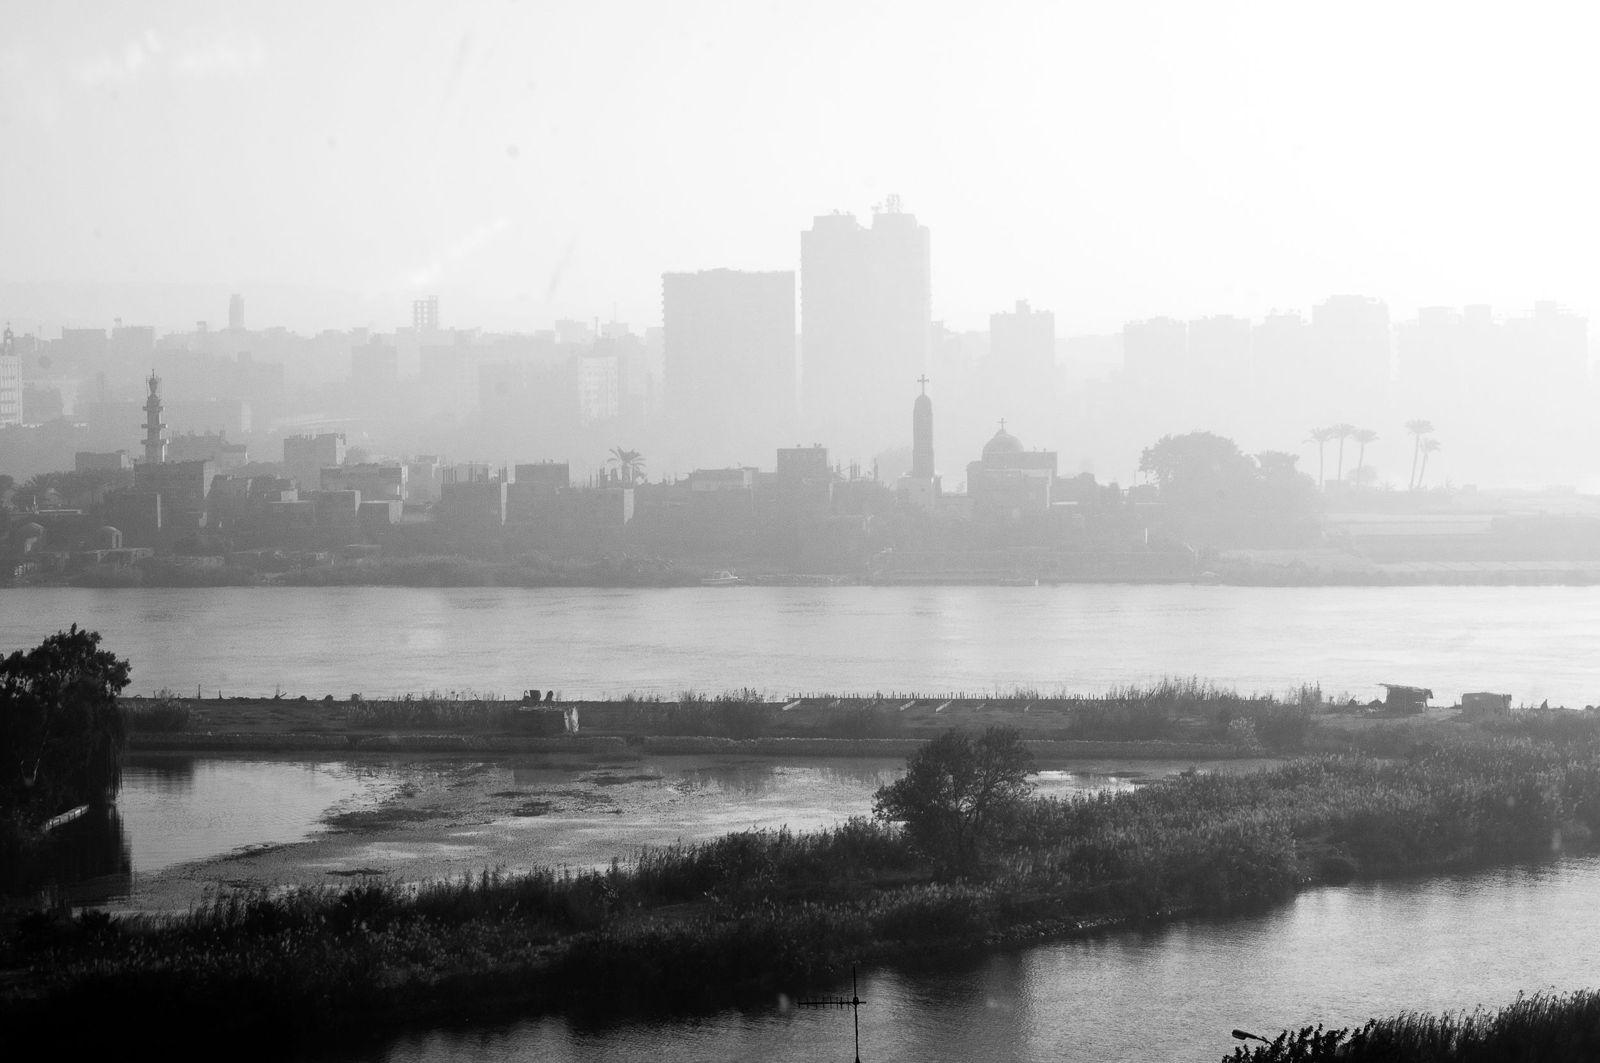 Екатерина Буракова-Шчекич. Каир-Александрия. утренний вид. Каир.